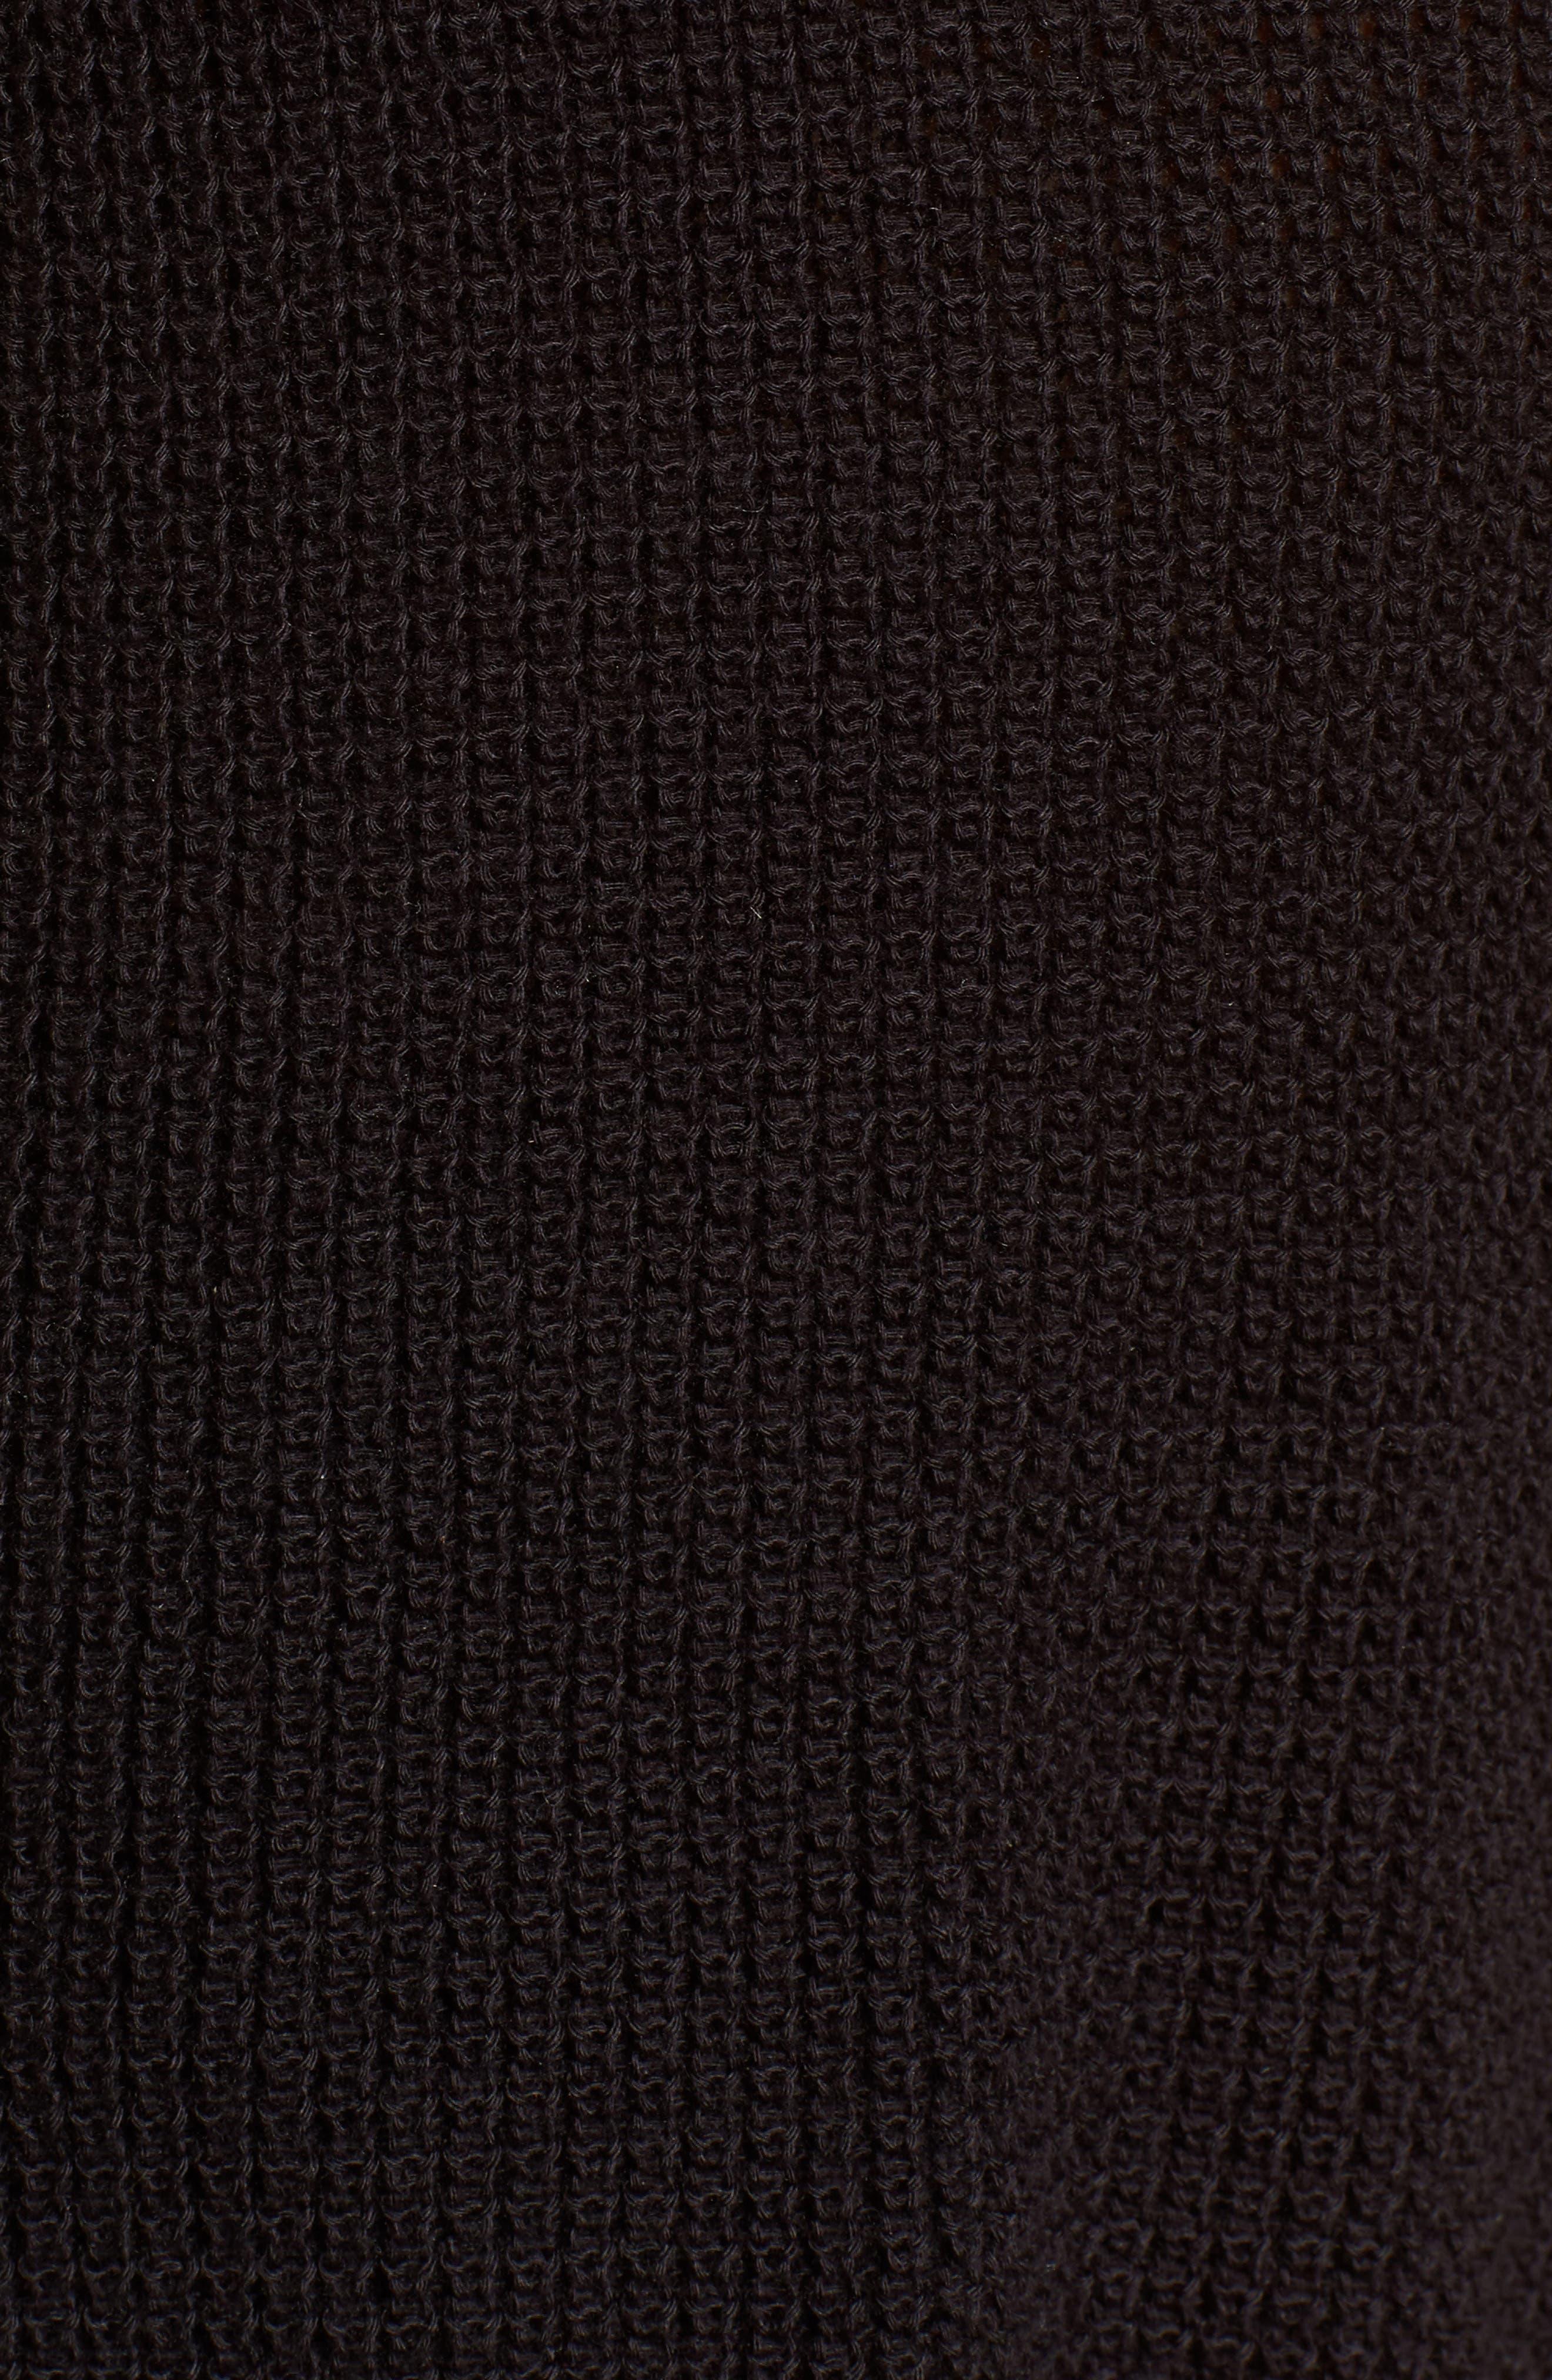 COTTON EMPORIUM,                             Sweater Tank Top,                             Alternate thumbnail 6, color,                             001